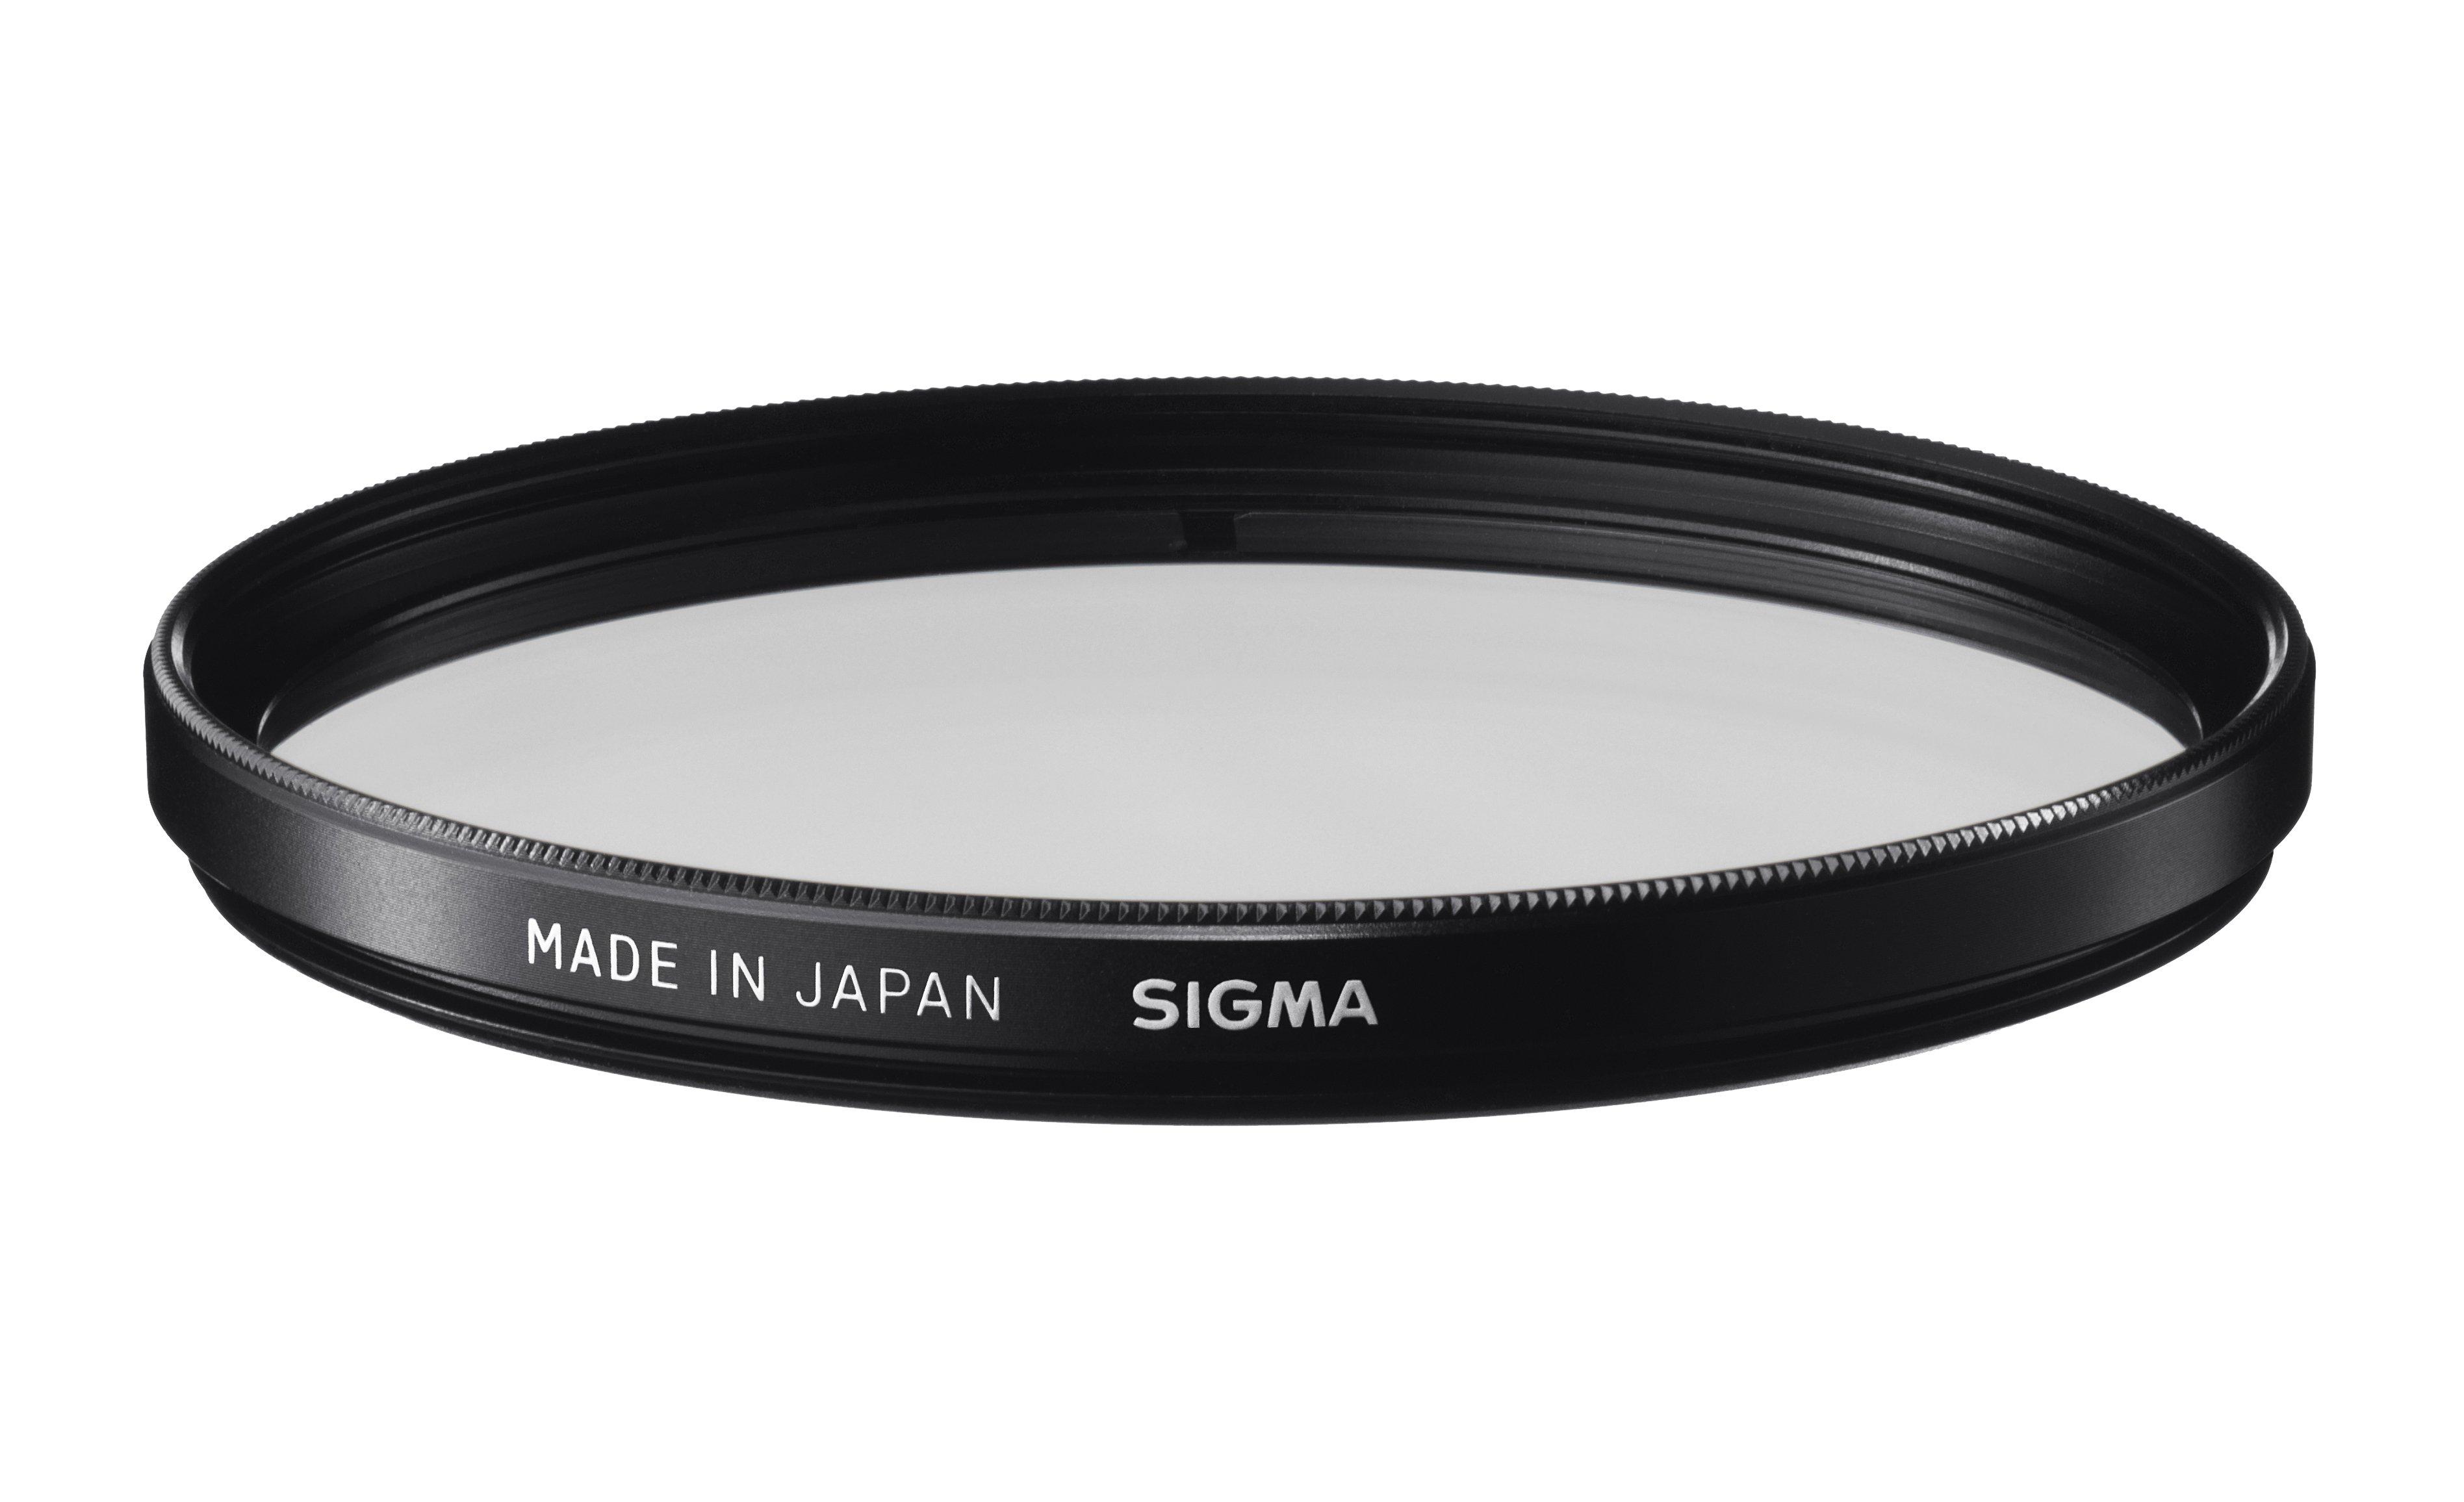 SIGMA filtr UV 86 mm WR